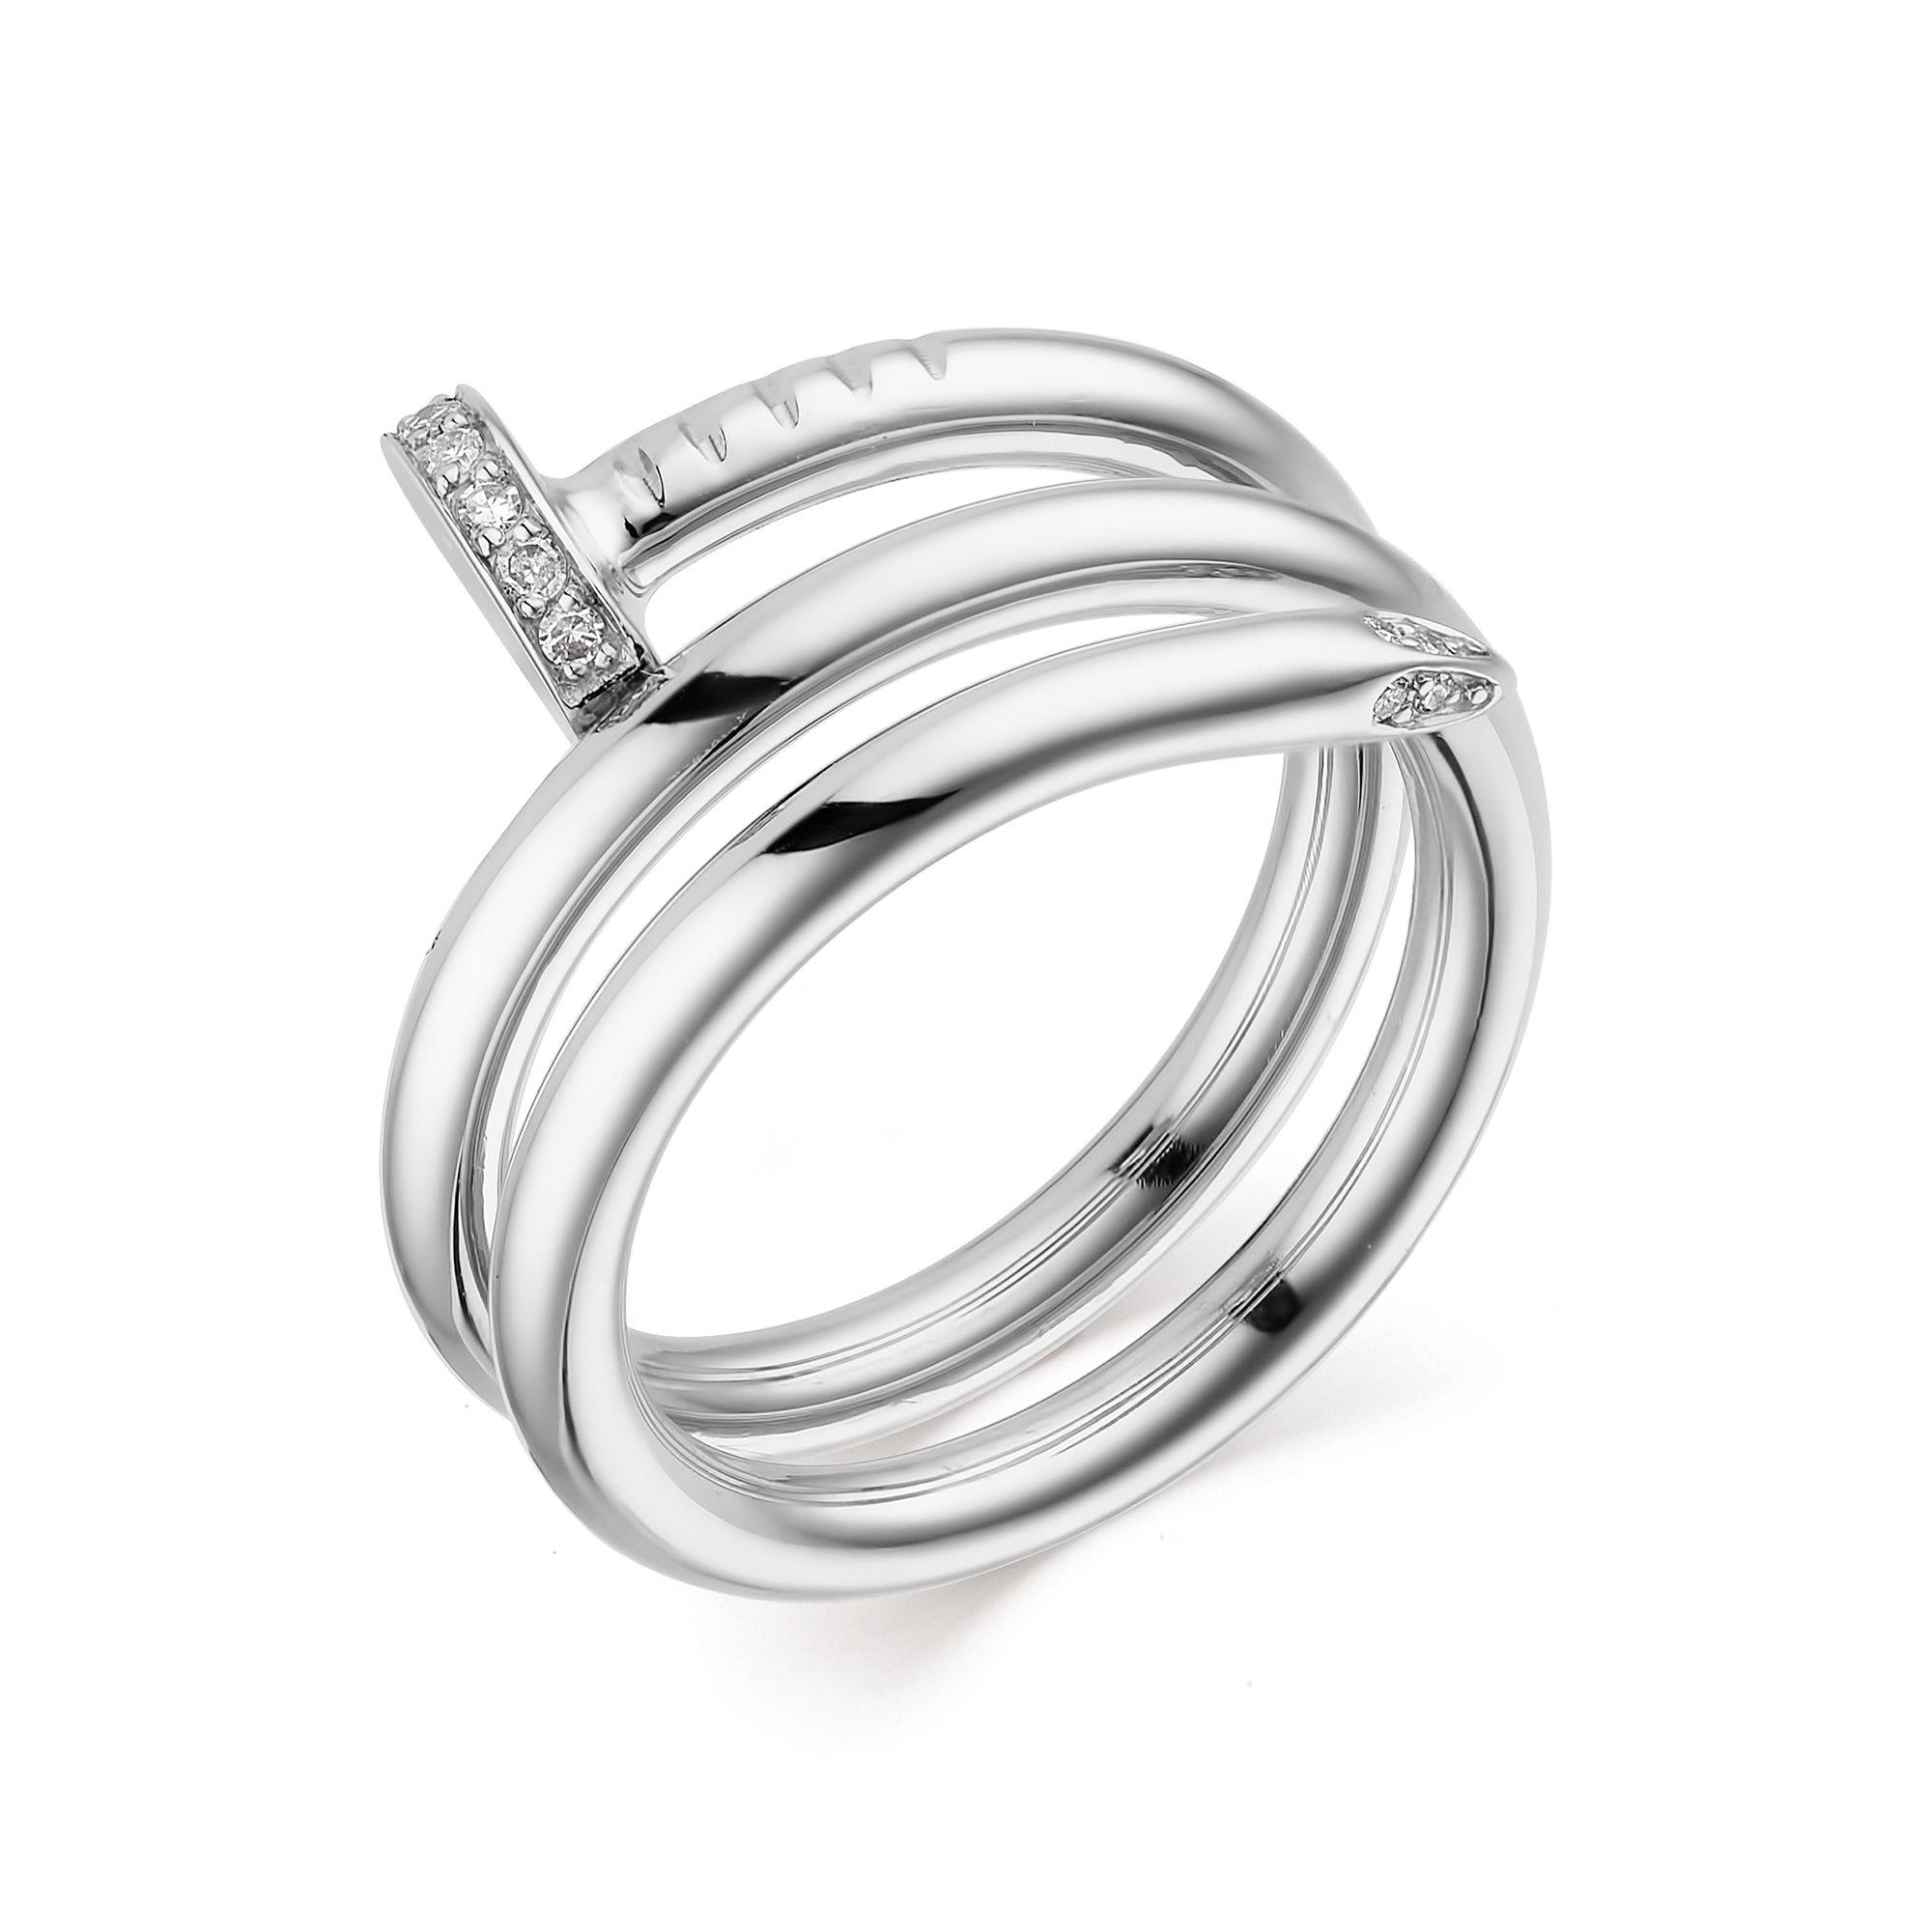 картинка кольцо 13637-200 13 бриллиант круг 17 0,100 120-200 2/3а, 8 бриллиант круг 17 0,022 200-400 2/3а 13637-200